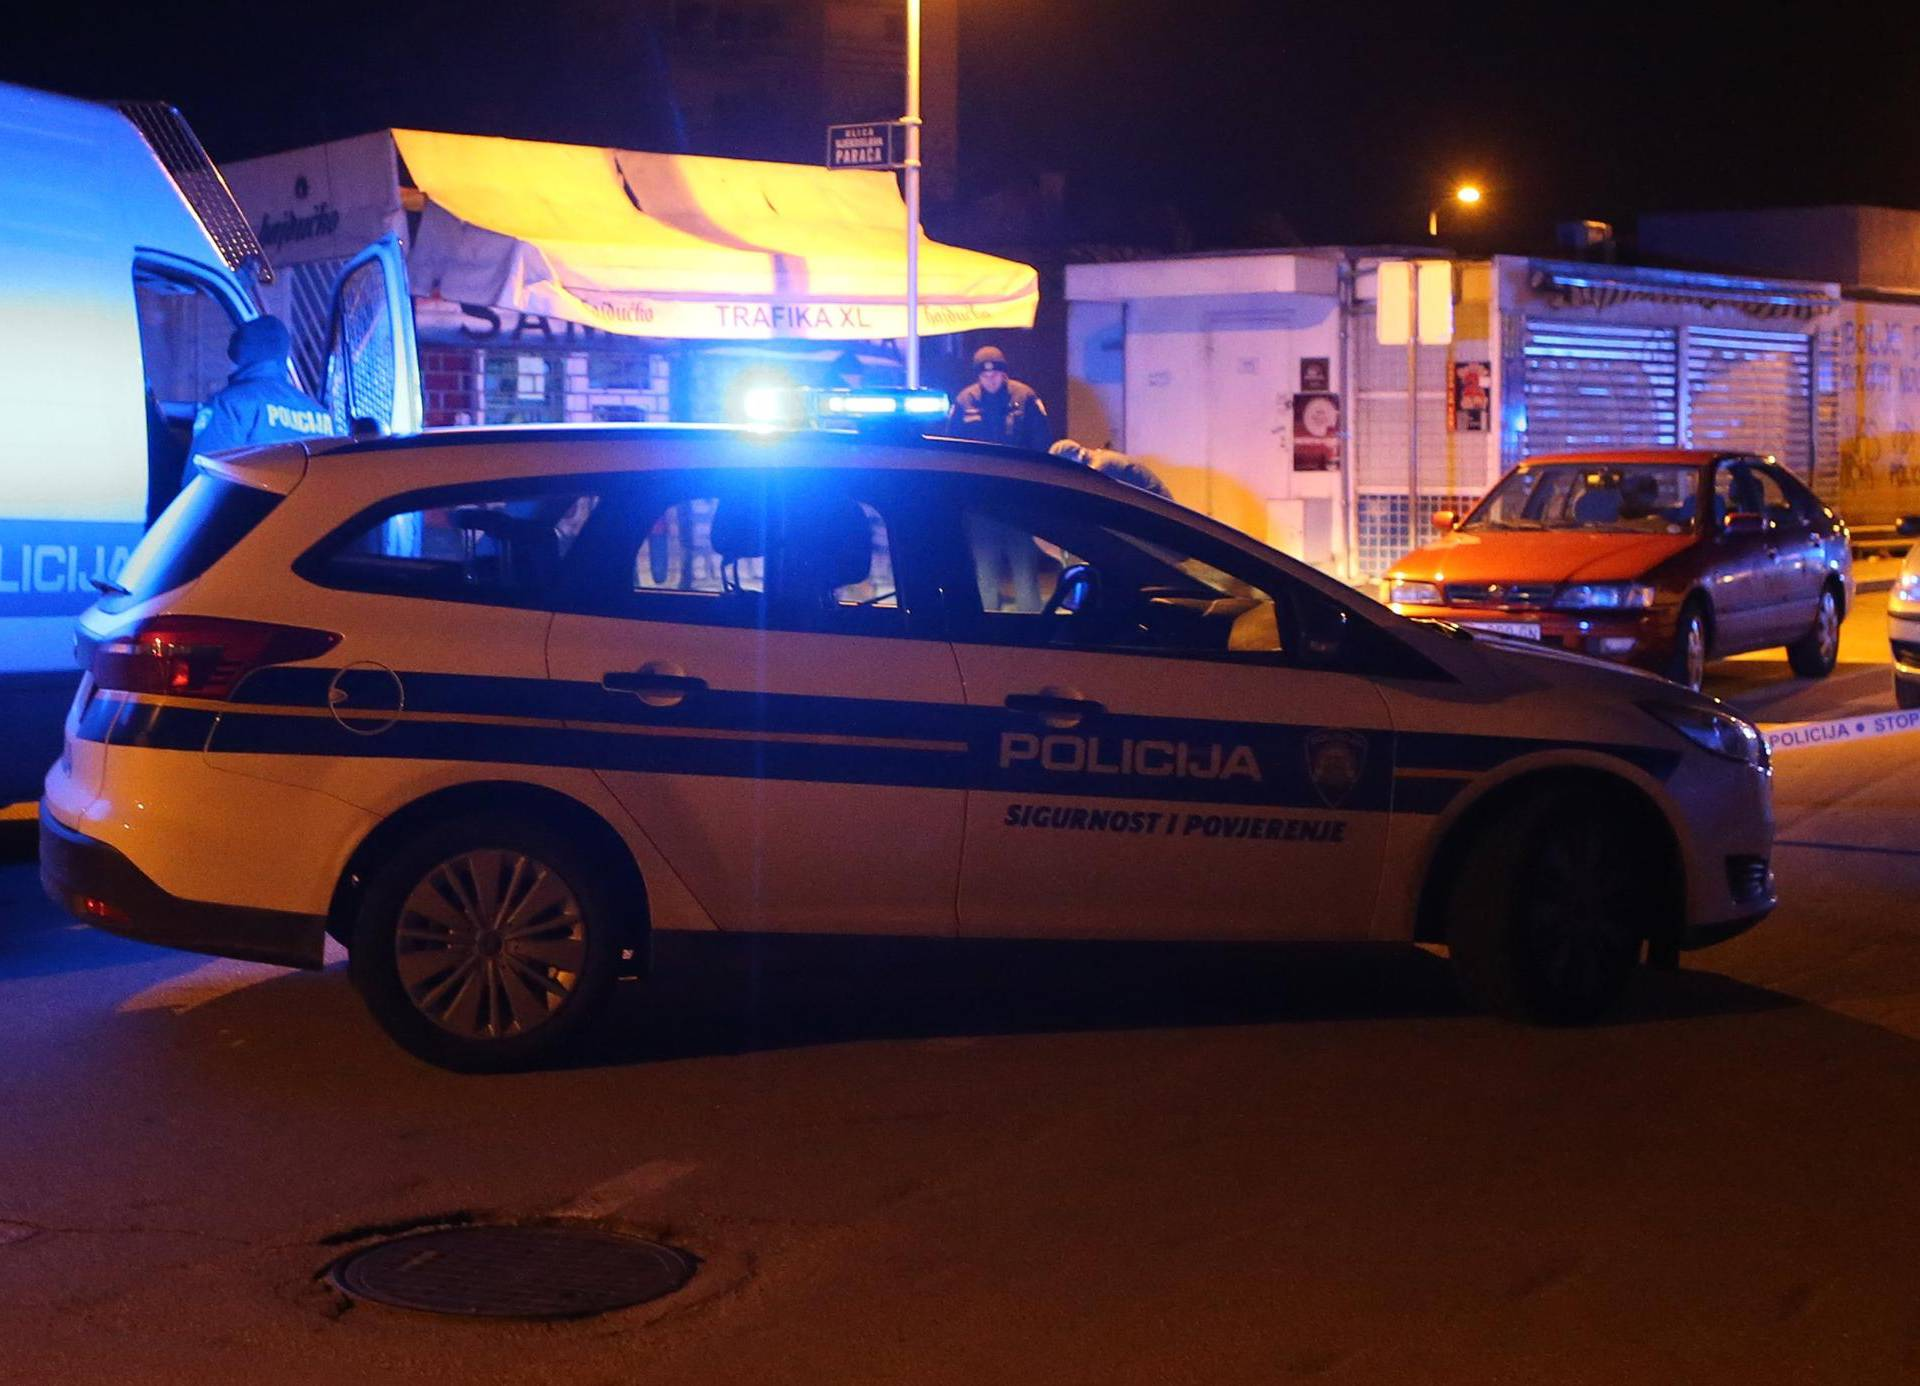 Policija blokirala tramvajski promet zbog pretresa auta